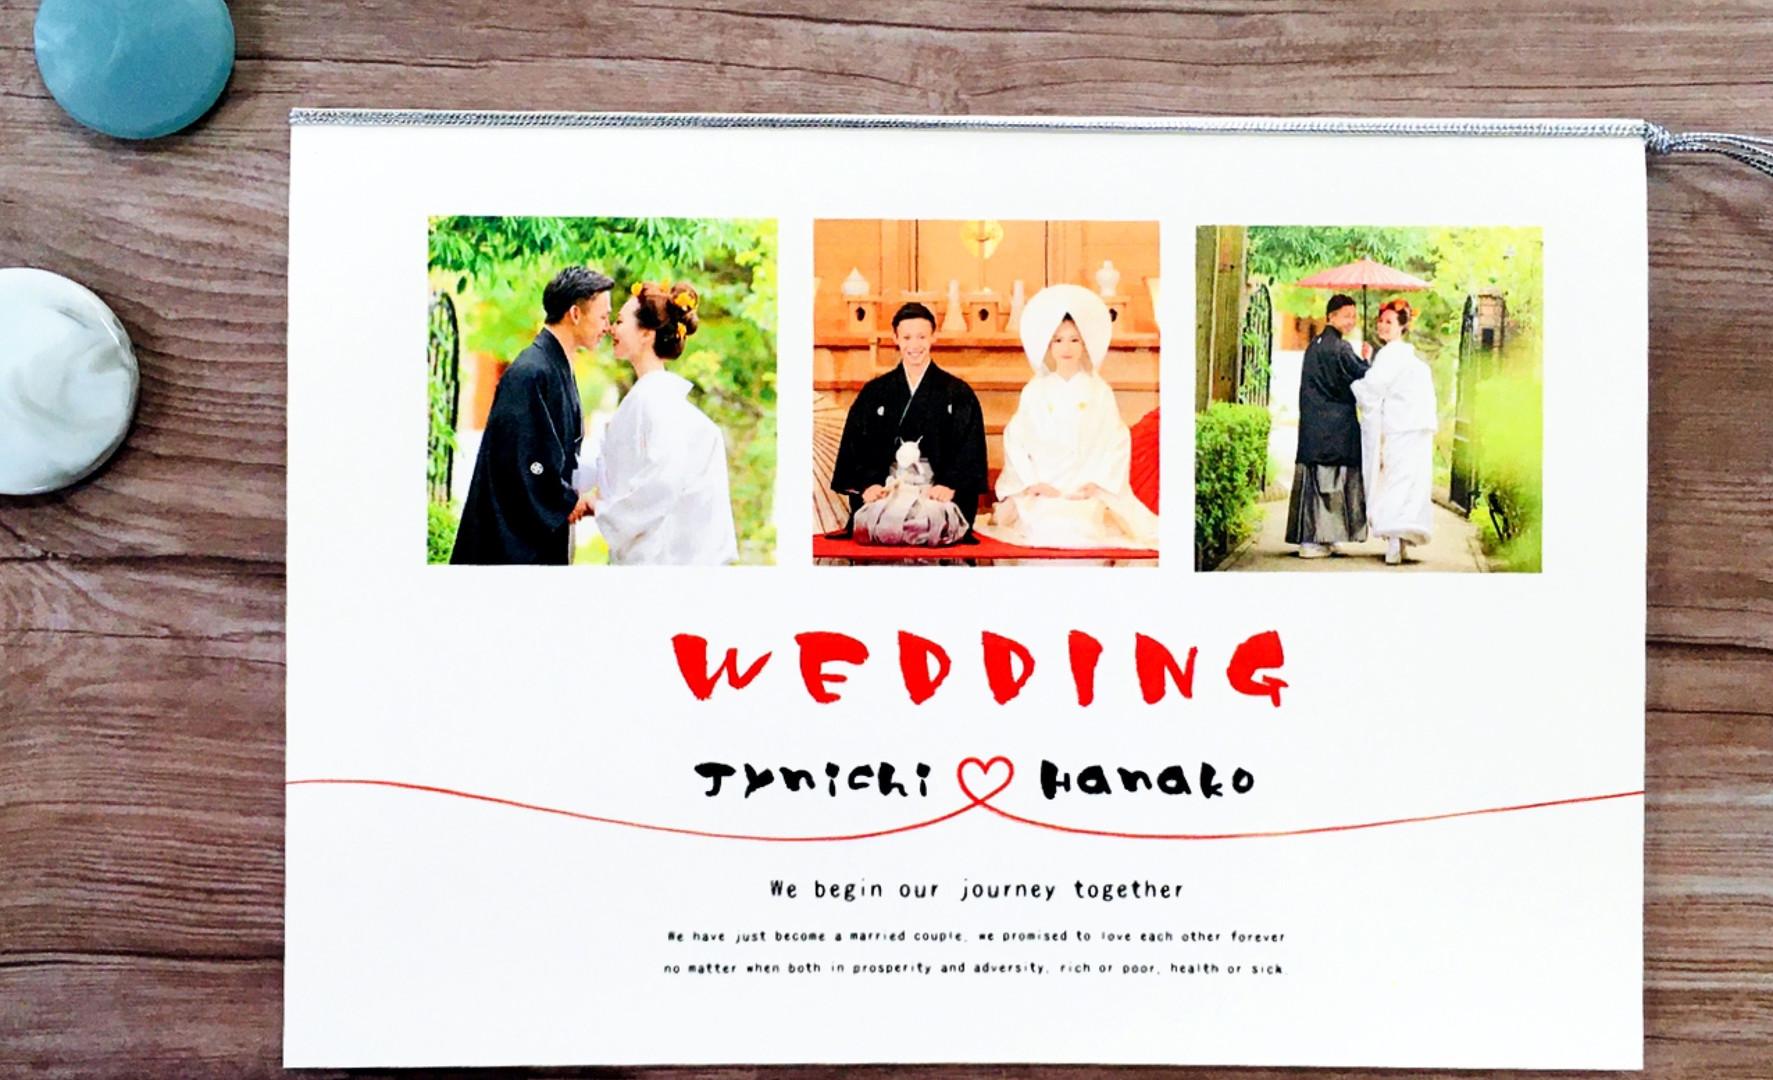 Just married デザイン9-B-1.jpg